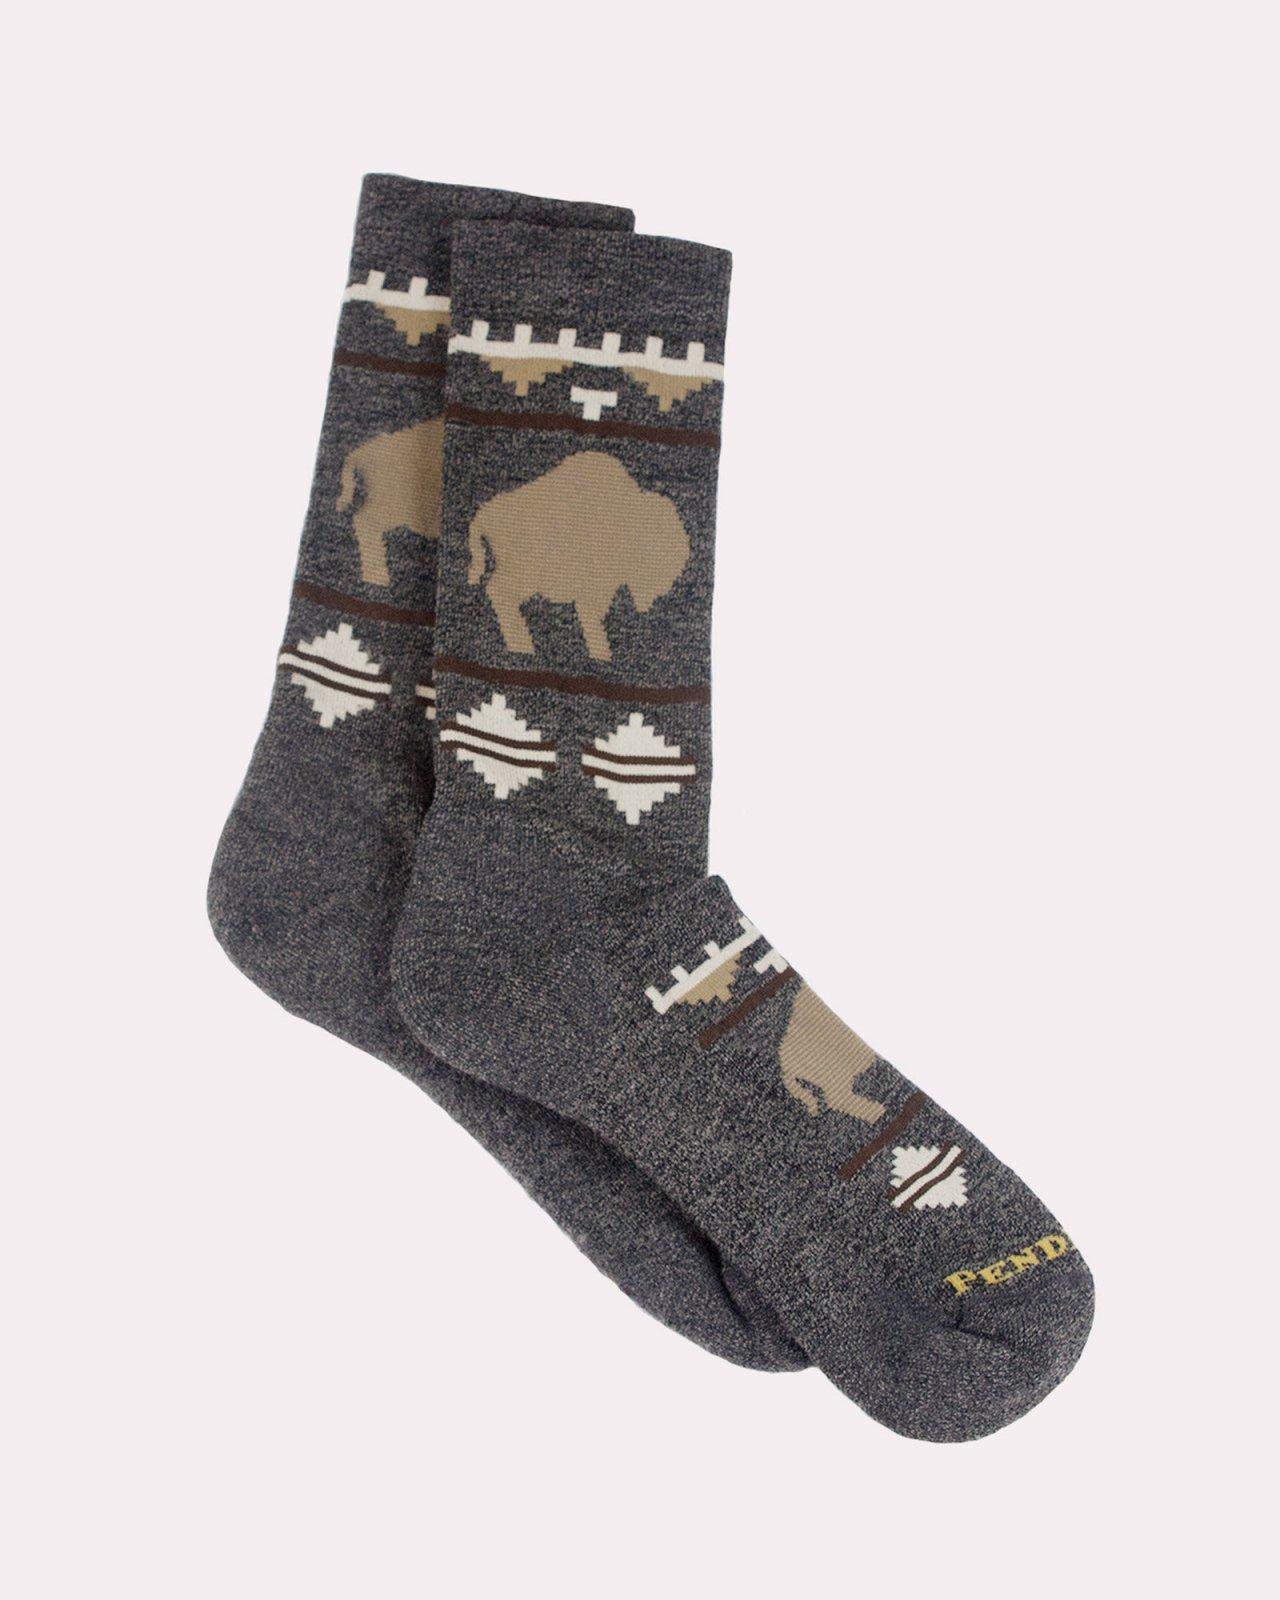 Roaming Bison Camp Sock from Pendleton